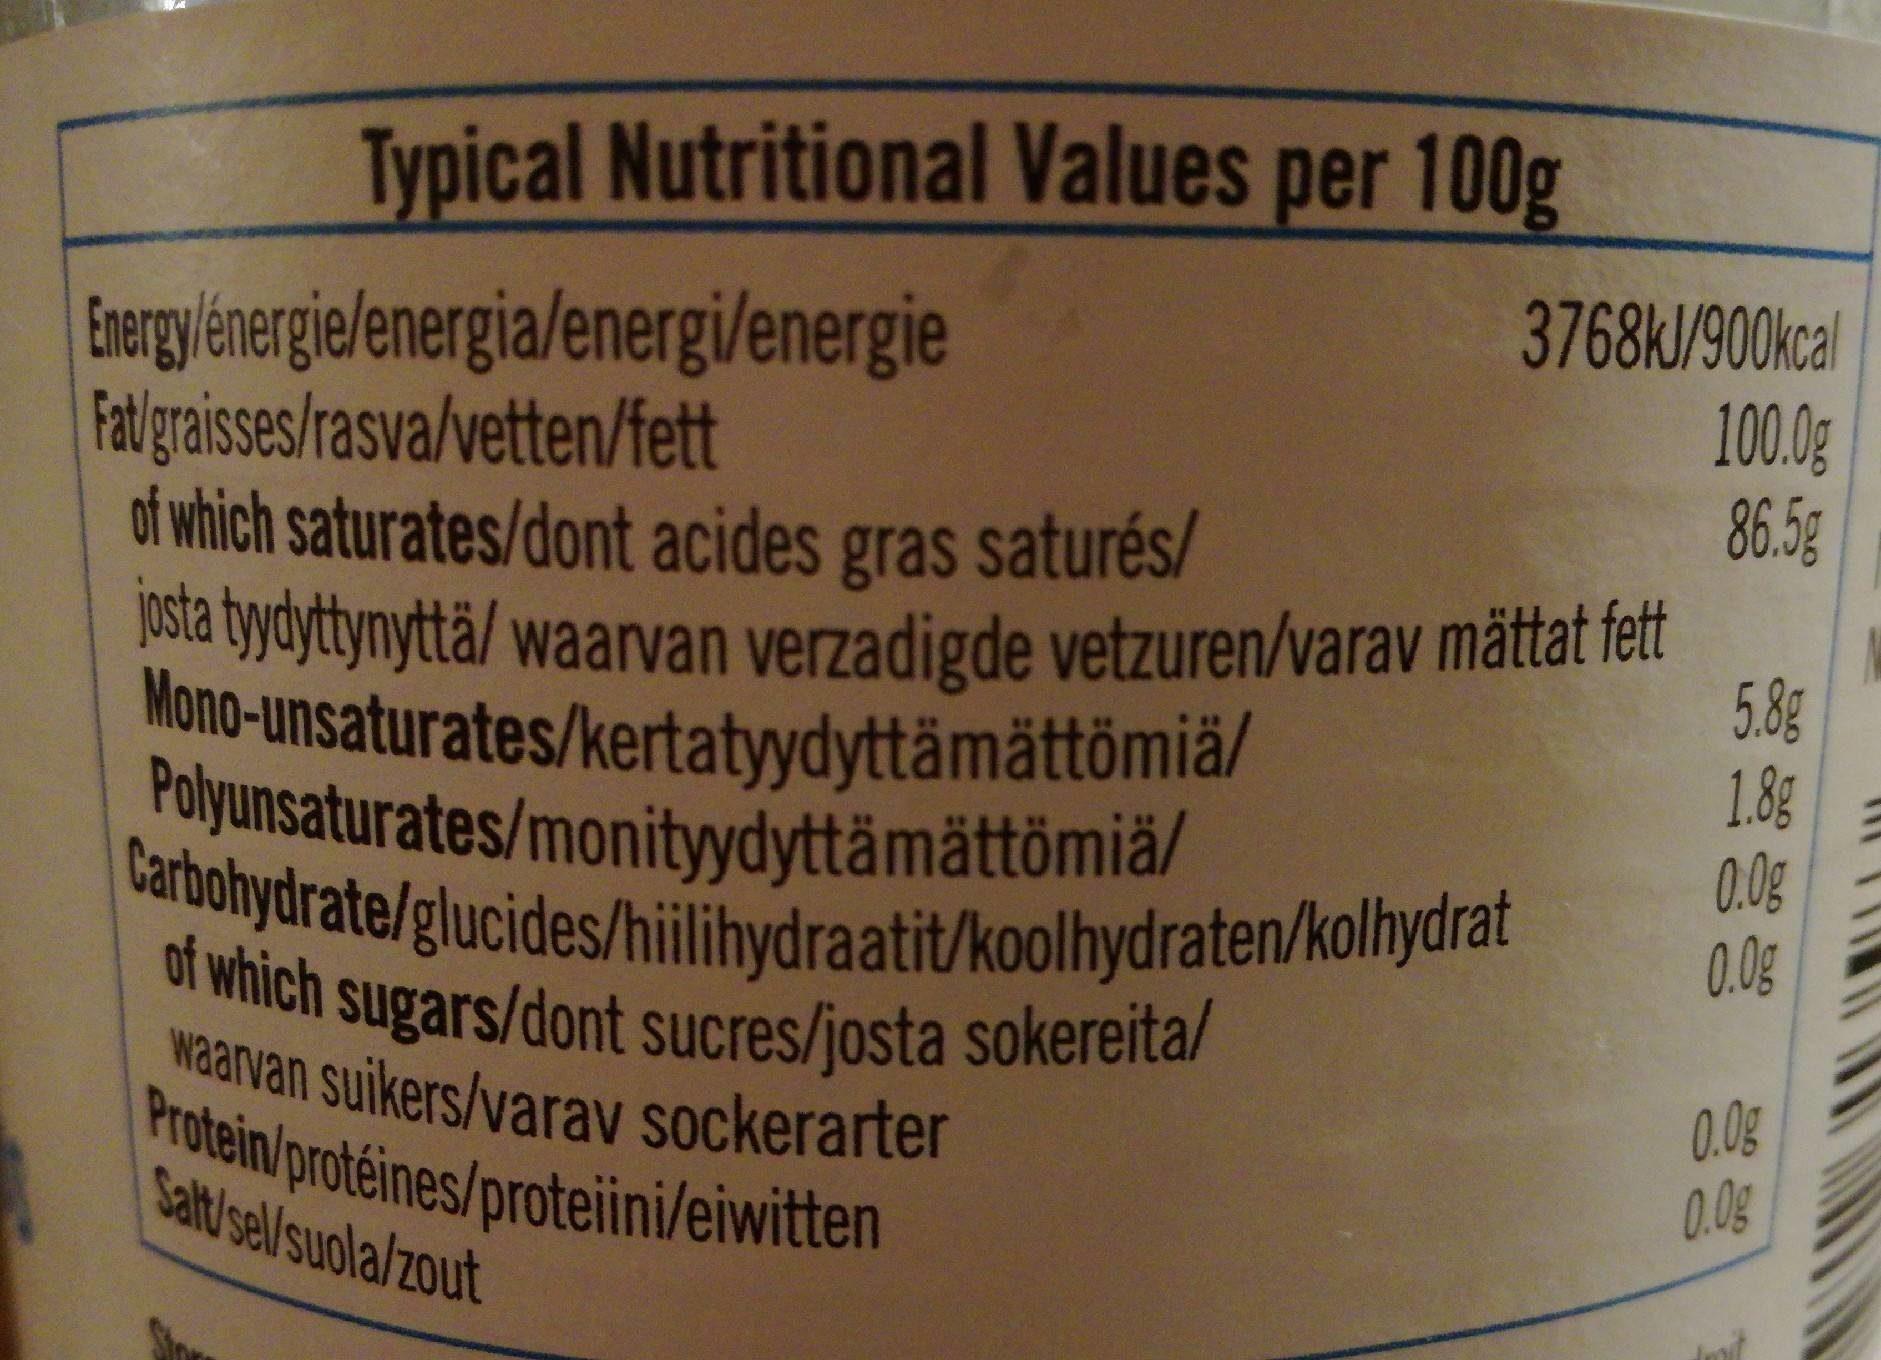 Mild Odourless Coconut Oil Cuisine - Informations nutritionnelles - fr